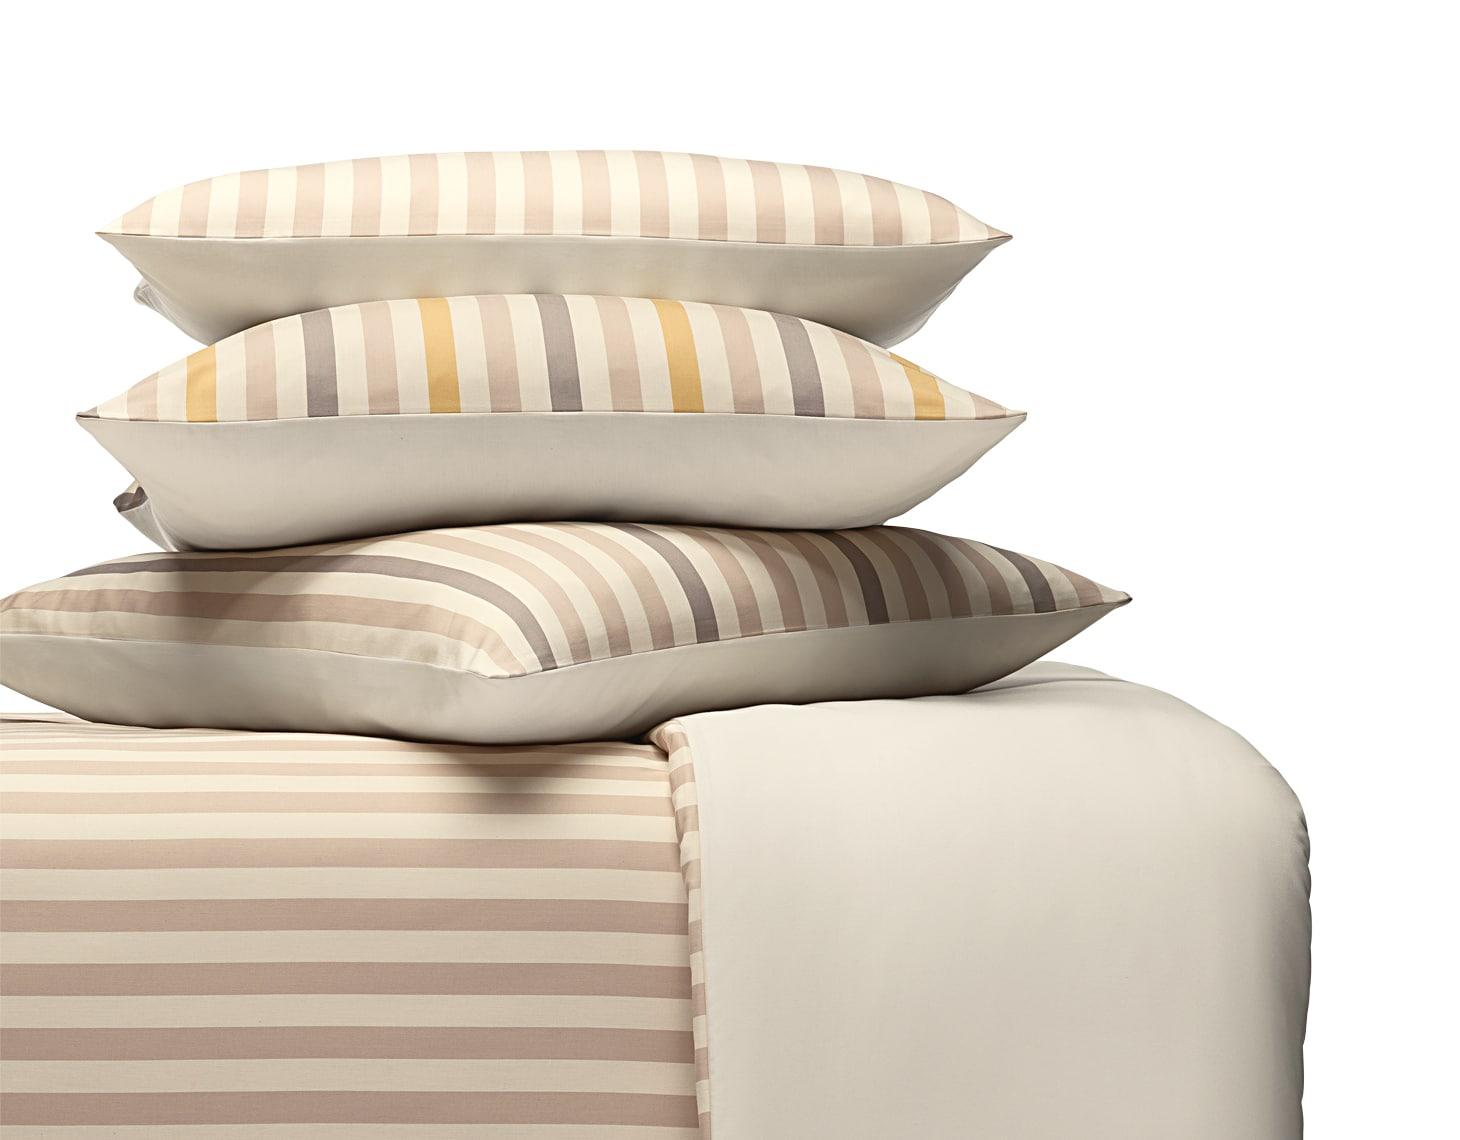 bettw sche satin linell biom bel bonn. Black Bedroom Furniture Sets. Home Design Ideas